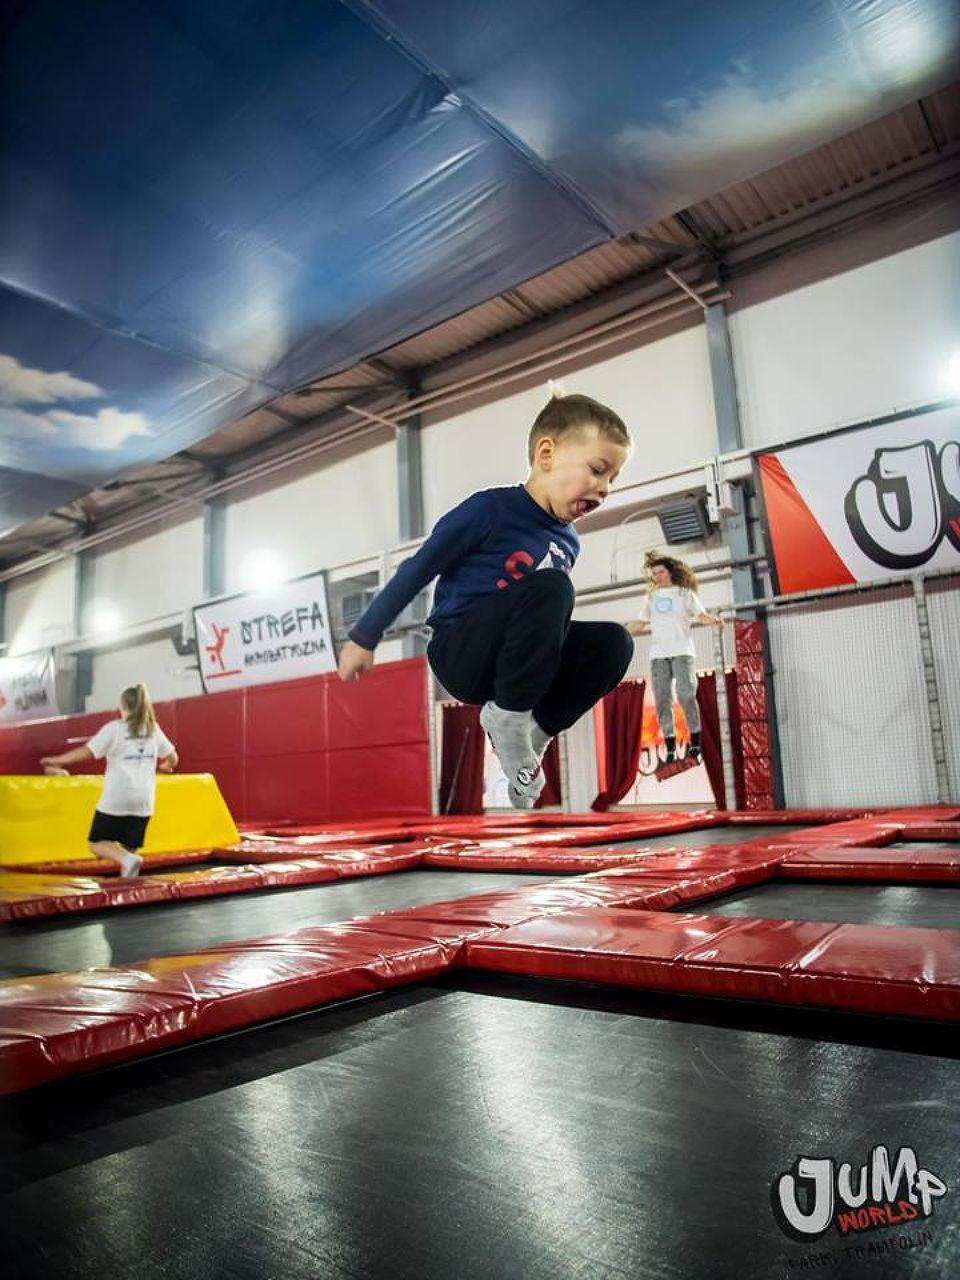 Jumpschool Classes for Kids